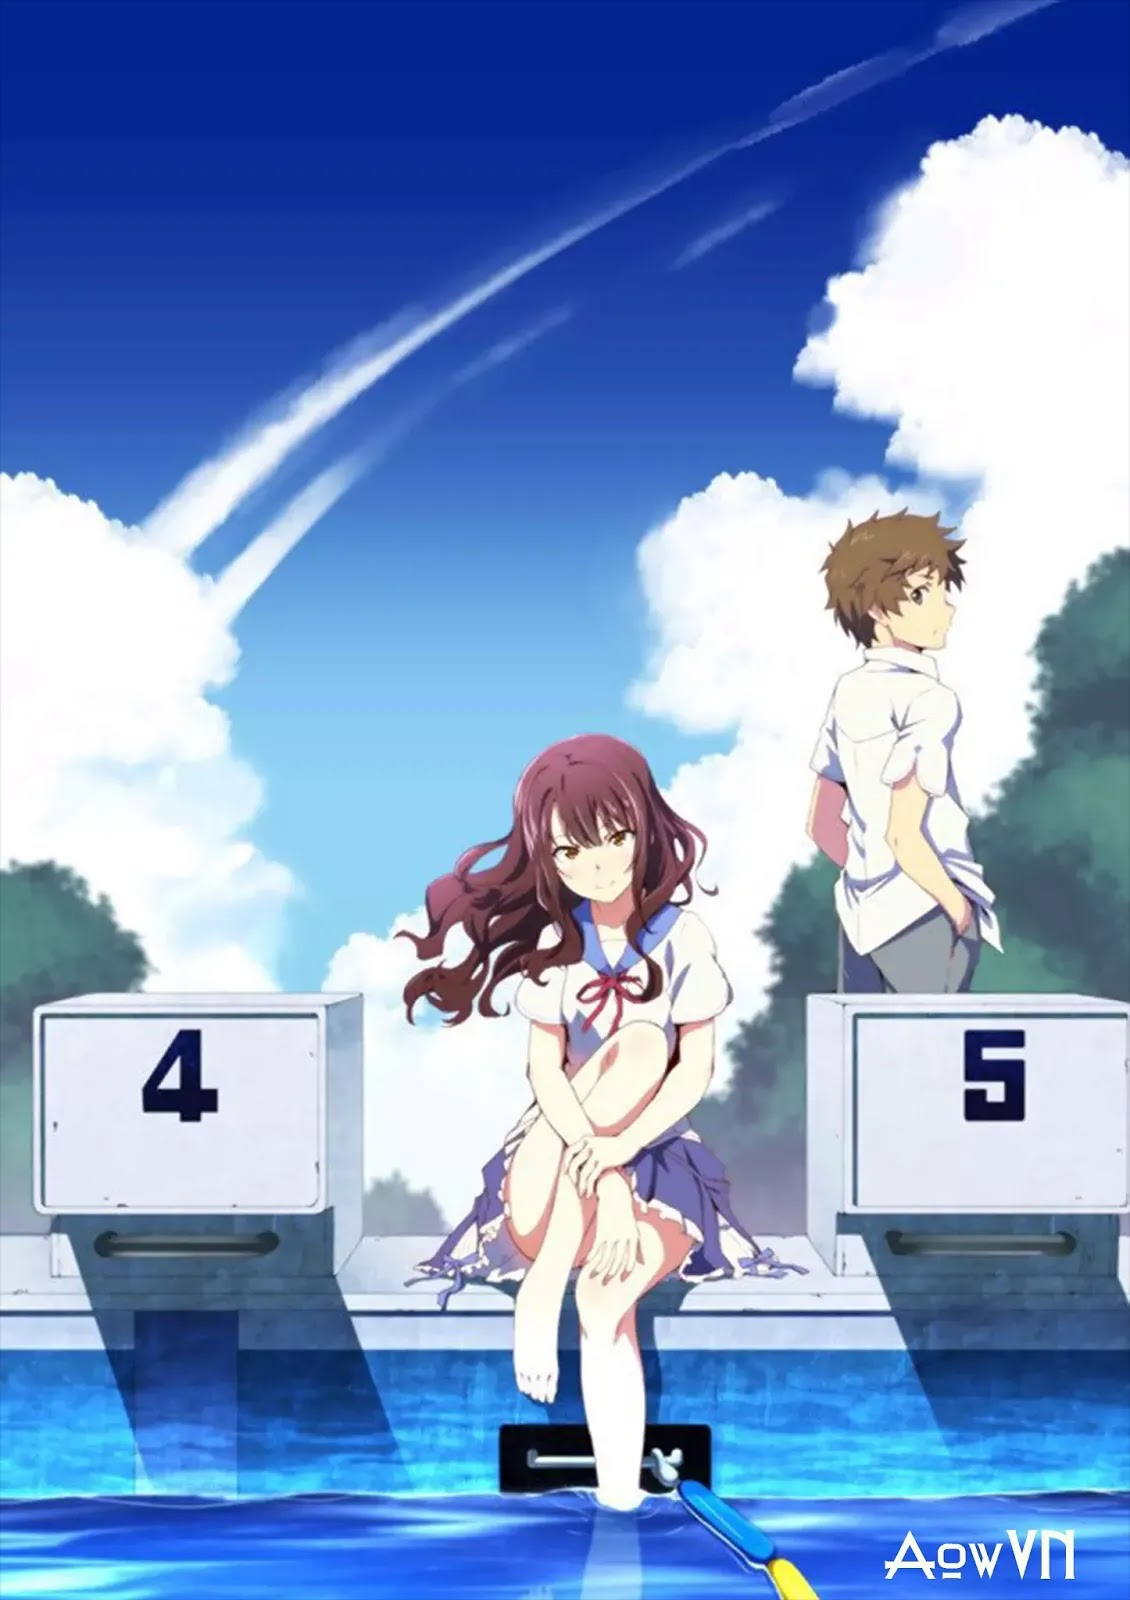 AowVN.org minz%2B%252811%2529 - [ Hình Nền ] Anime Uchiage Hanabi Shita Kara Miru Ka cực đẹp | AowVN Wallpapers